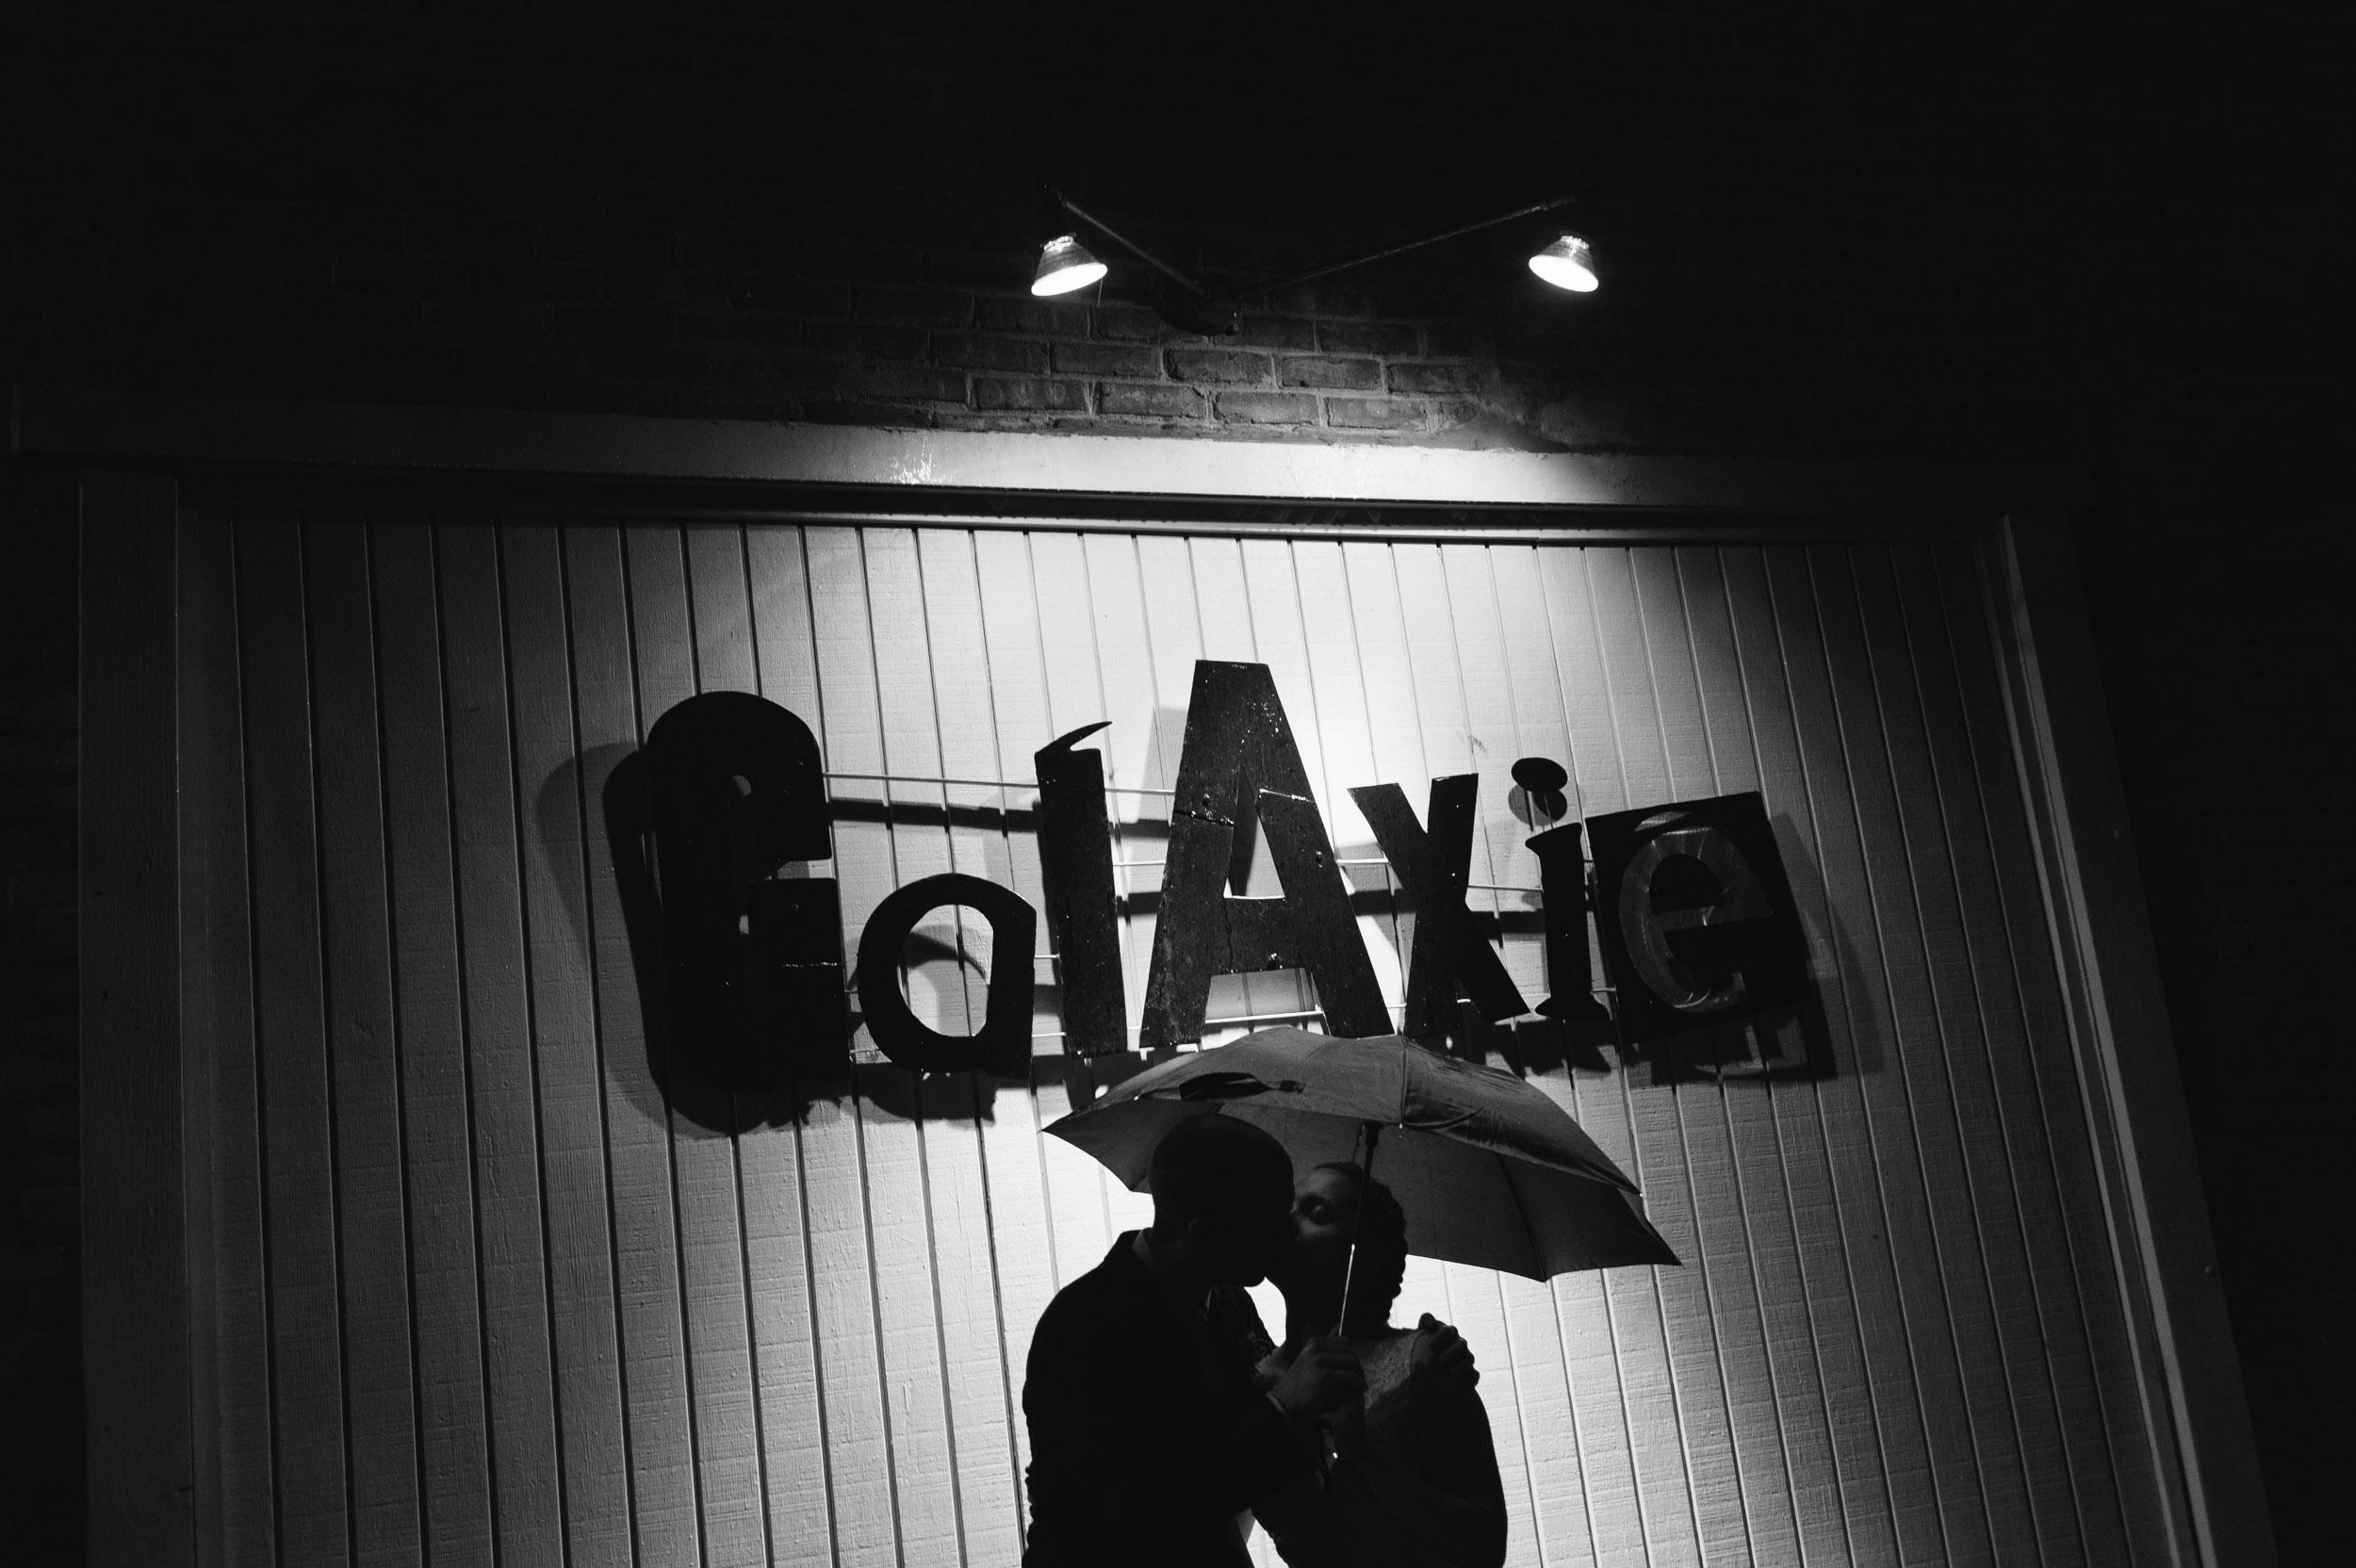 2017-03-31-danielle-gardner-photography--48.jpg